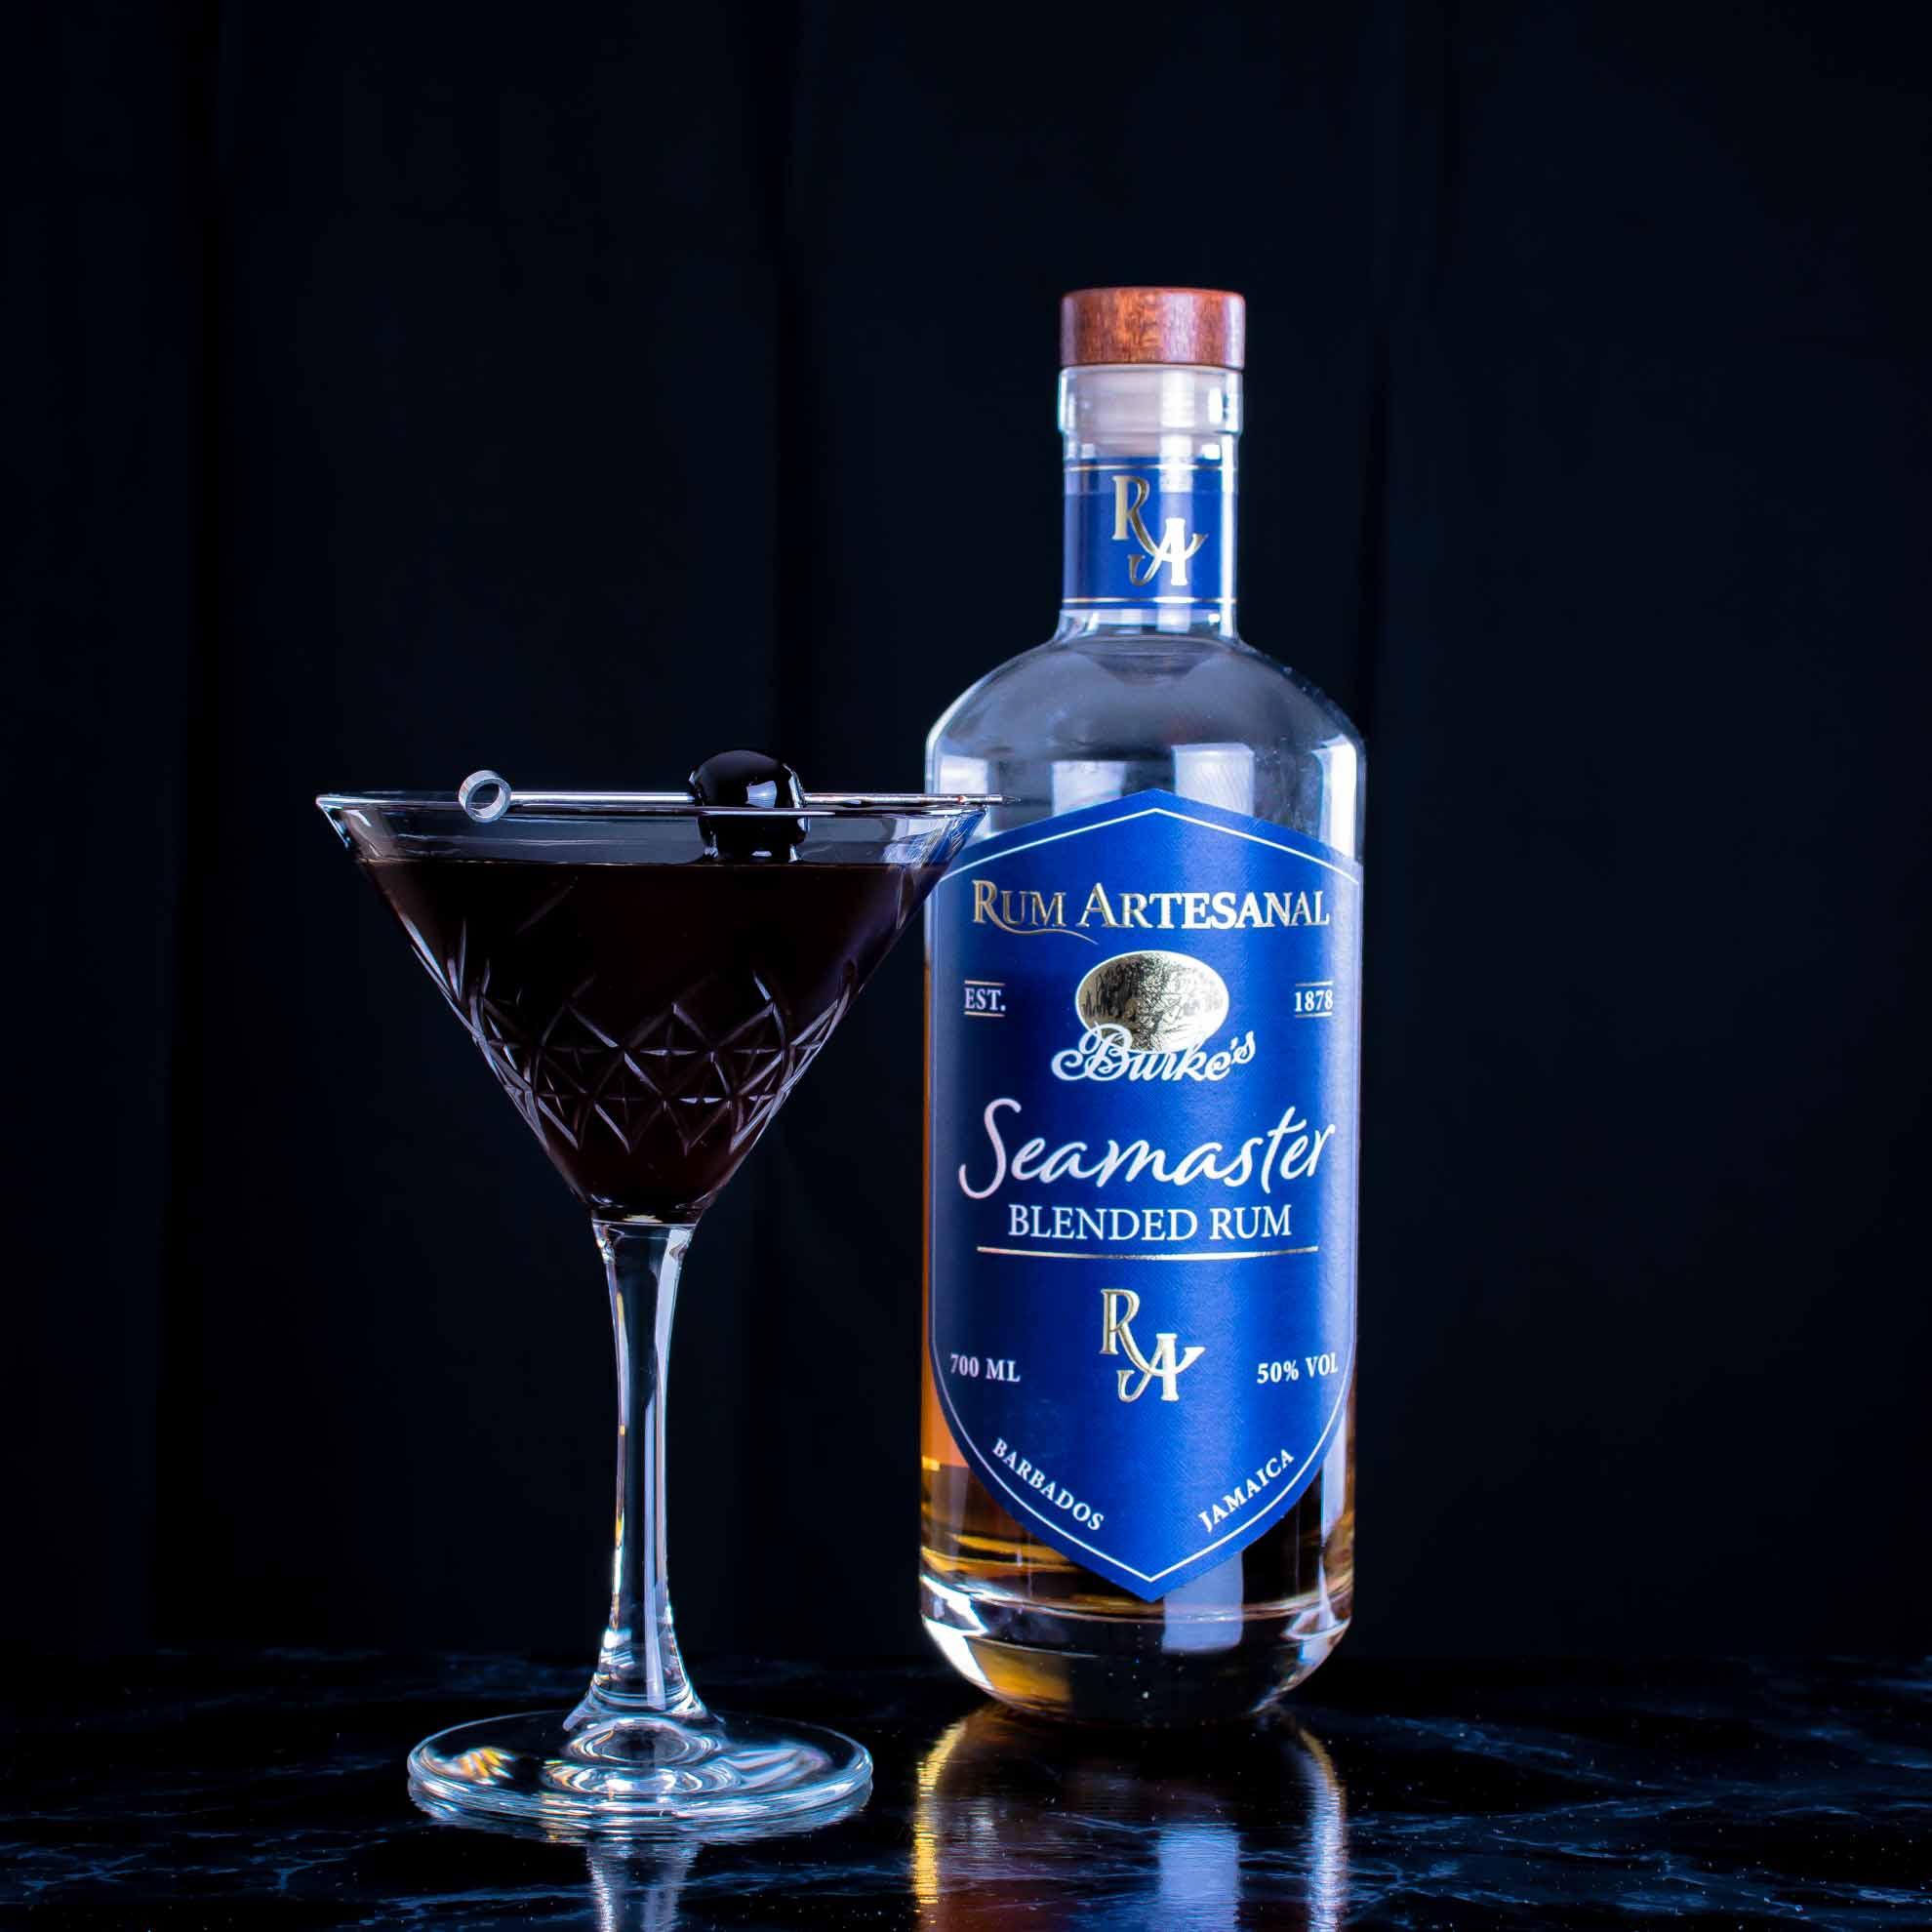 Rum Artesanal Burke's Seamaster Blended Rum im Coffee & Contemplation Cocktail.